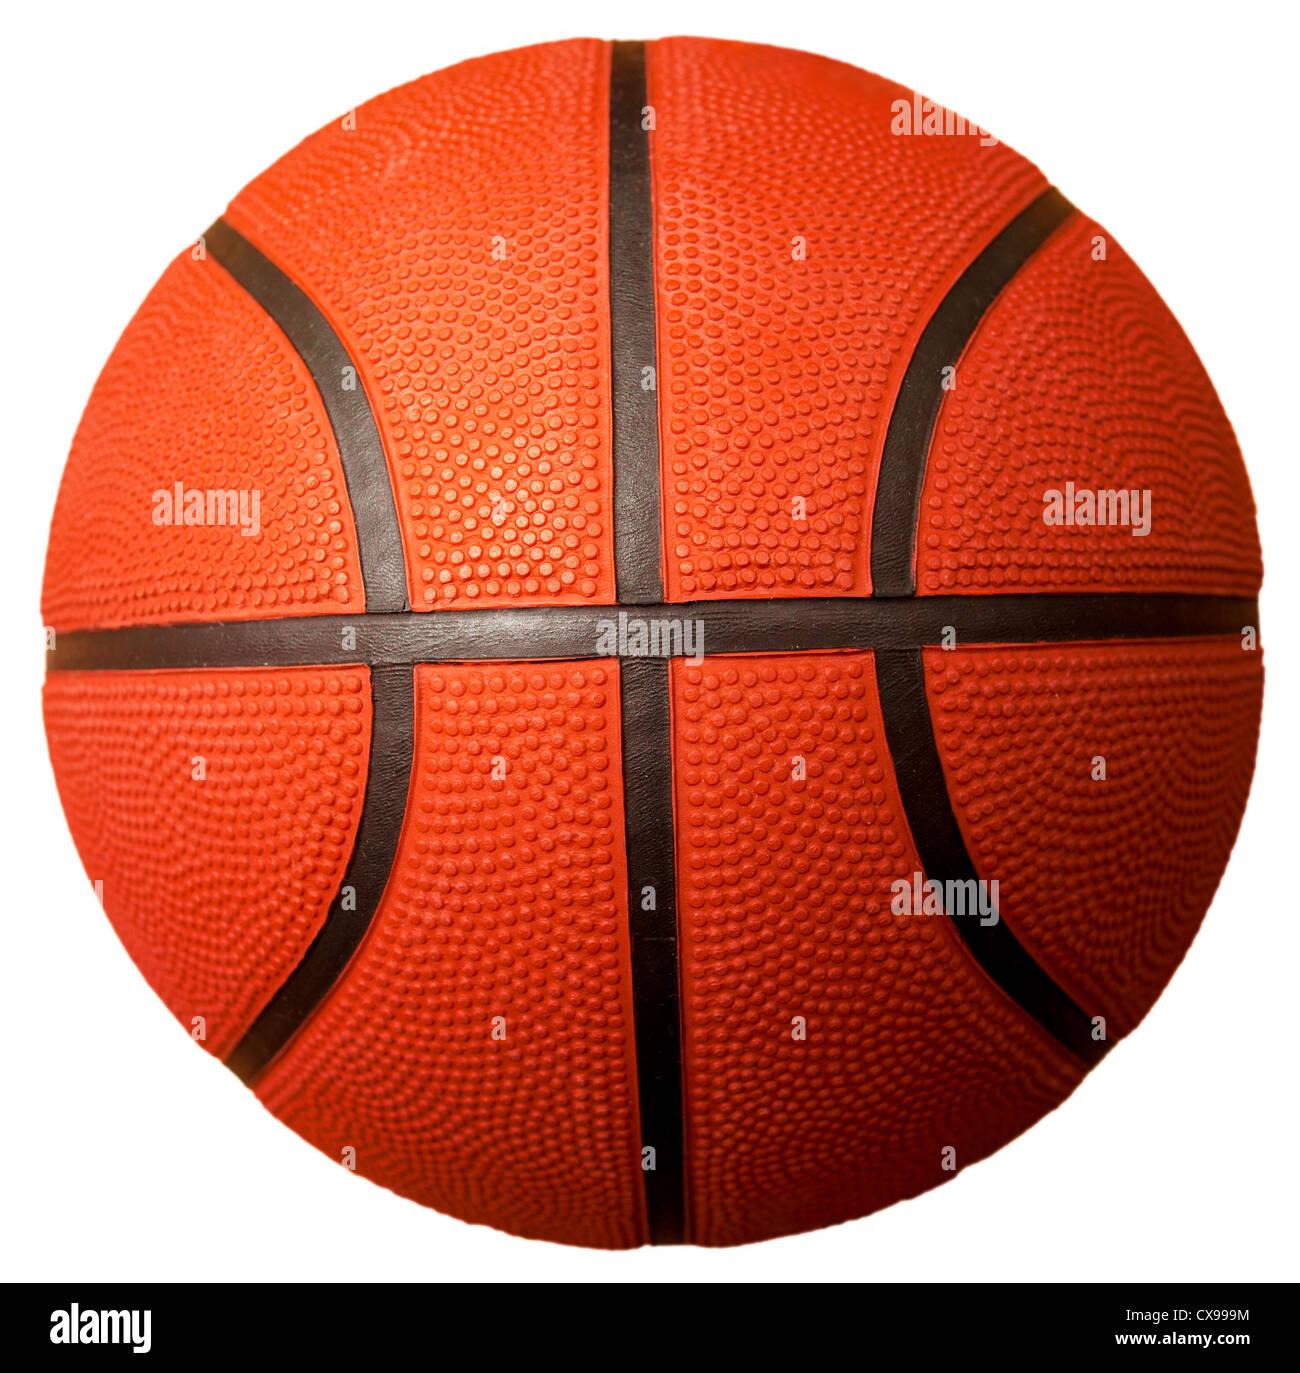 Basket-ball ball isolated on white Photo Stock